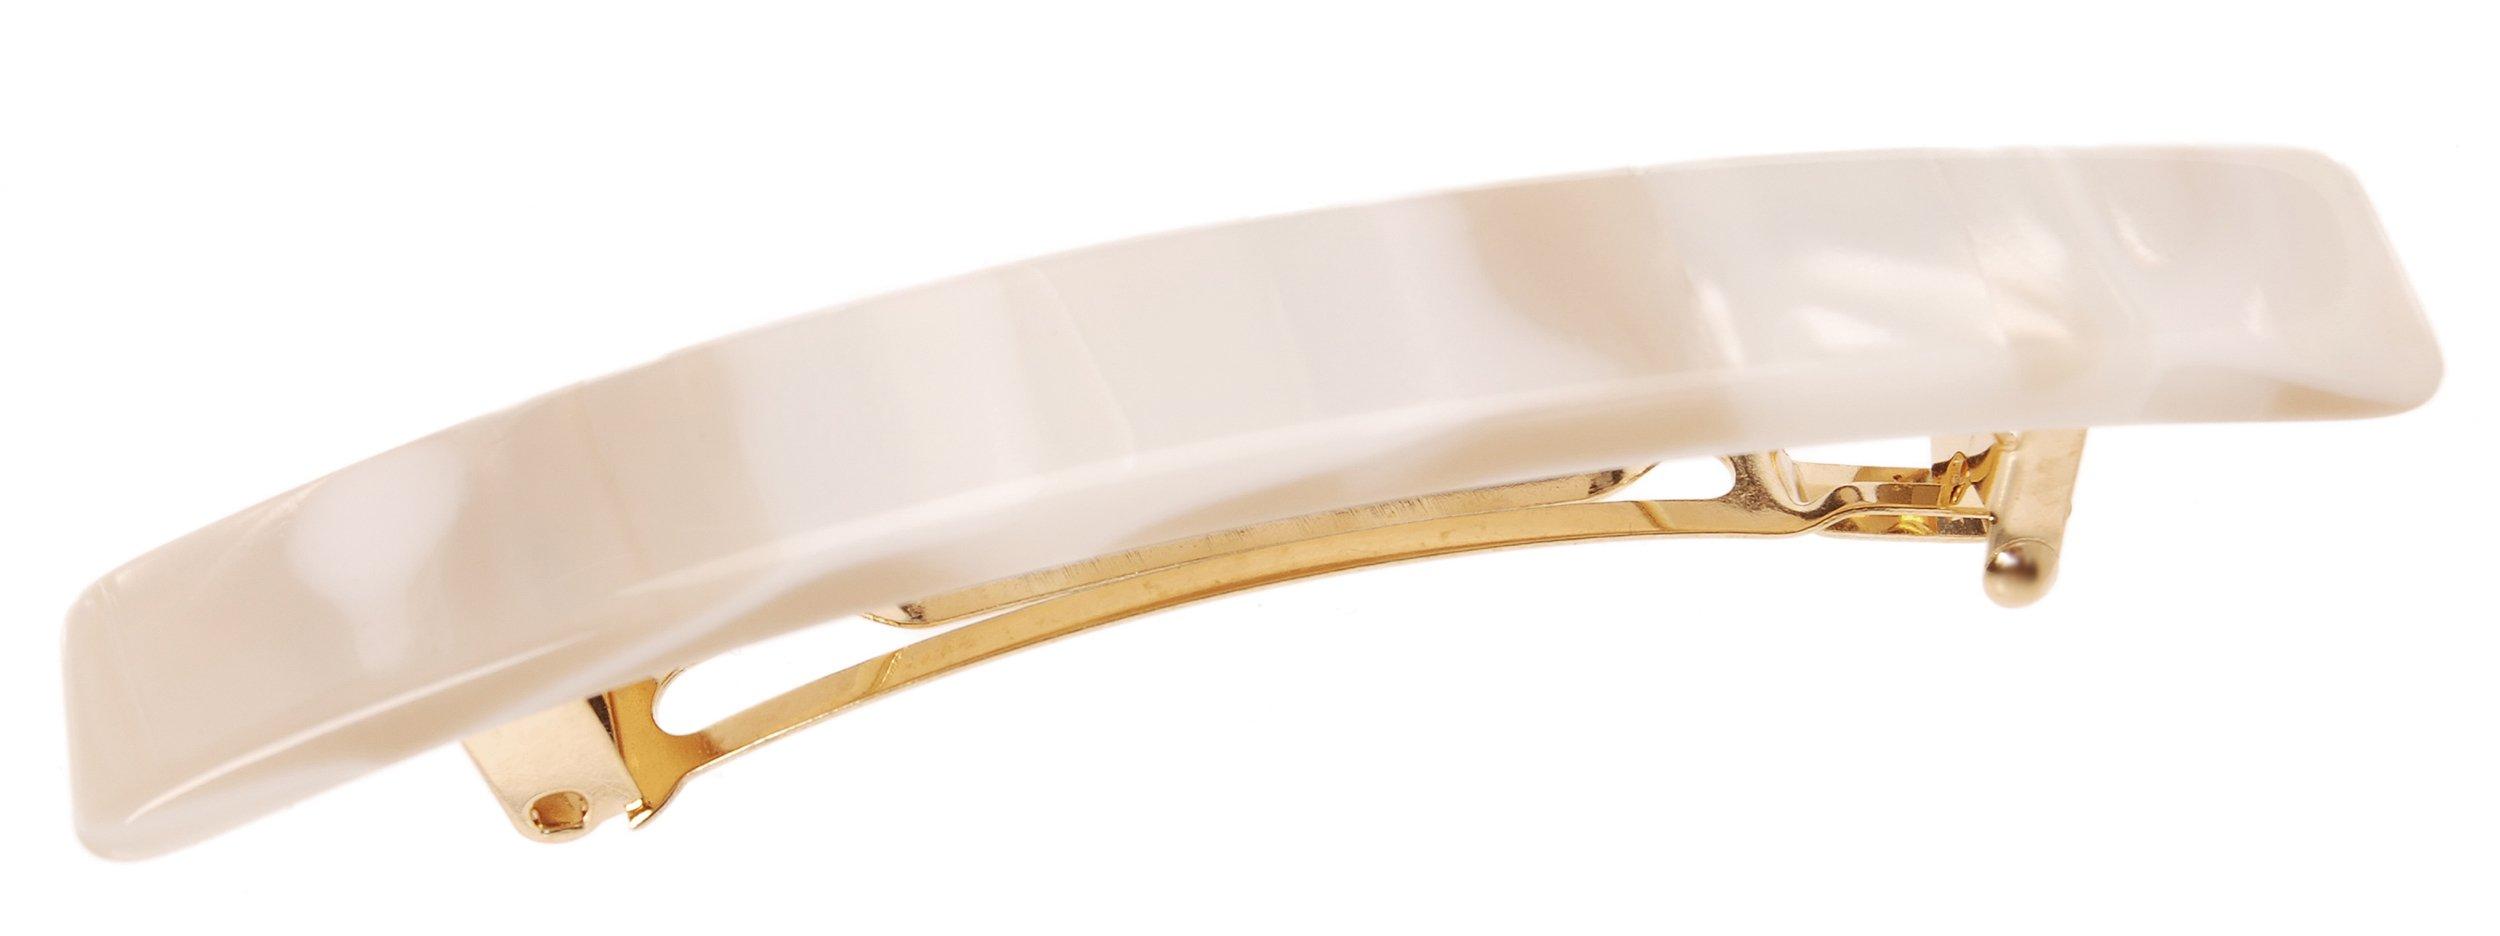 France Luxe Small Luxury Rectangle Barrette - Alba